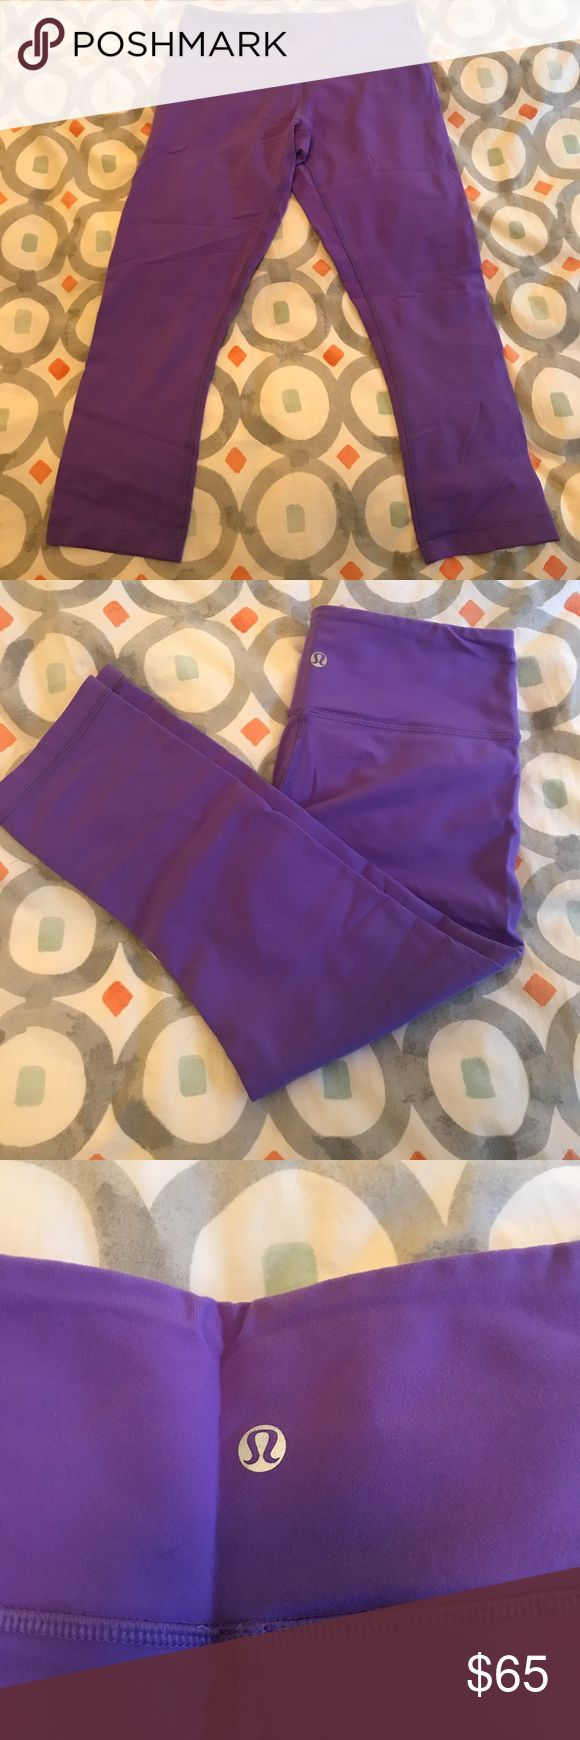 Purple Lululemon yoga/running crop legging! Purple Lululemon yoga/running crop legging! Just like these one but different color— https://shop.lululemon.com/p/women-crops/Wunder-Under-Crop-III-Full-On-Luon/_/prod240008?color=0001 lululemon athletica Pants Leggings